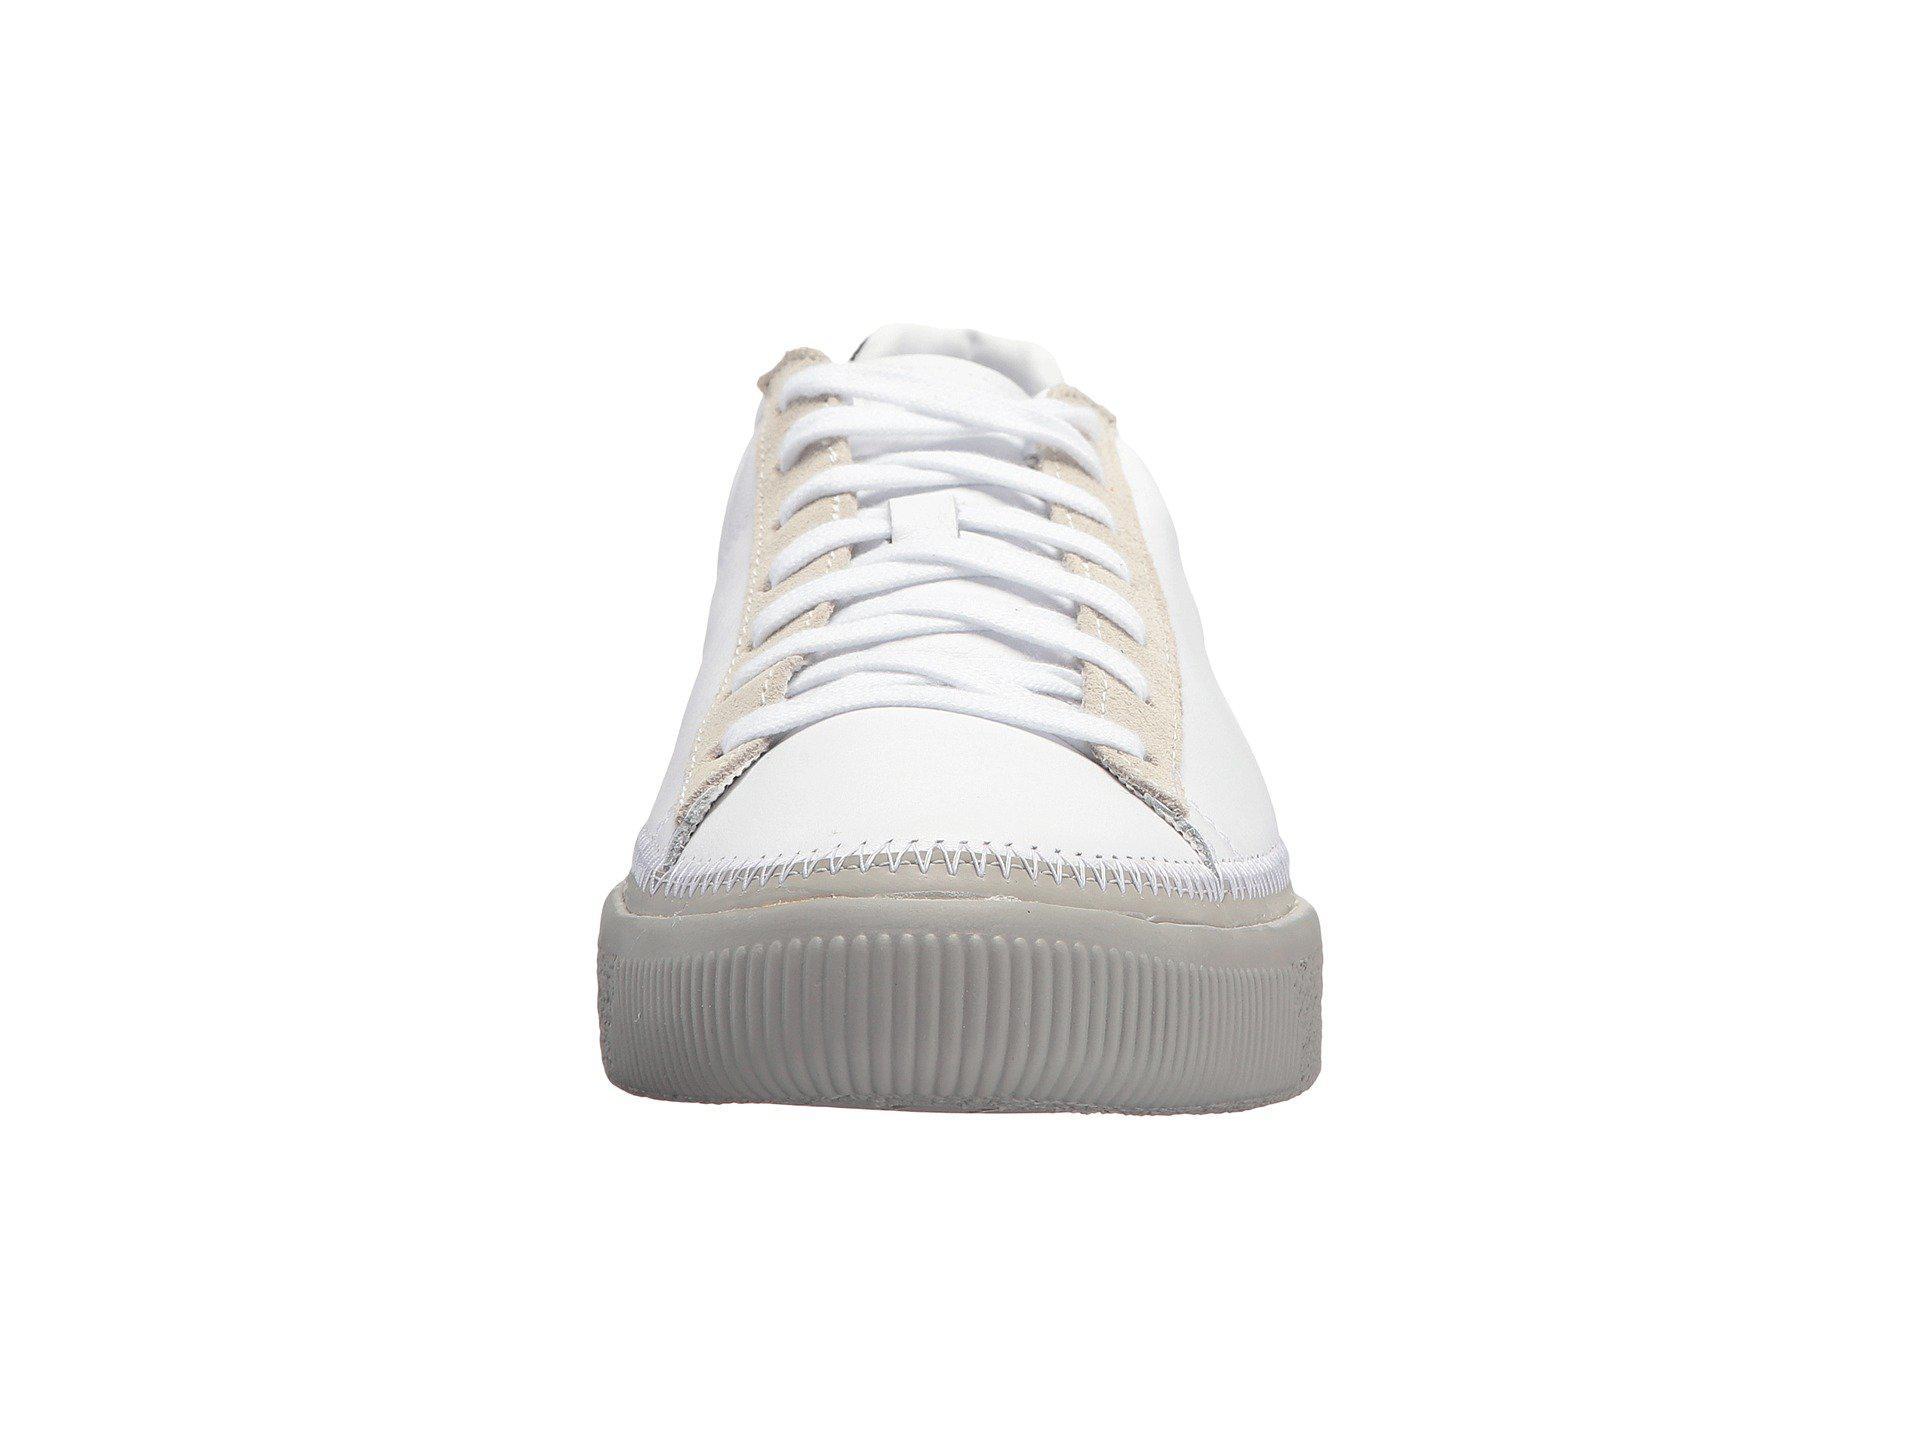 reputable site ff914 0b312 PUMA Multicolor X Han Kjobenhavn Basket Stitched Sneaker for men